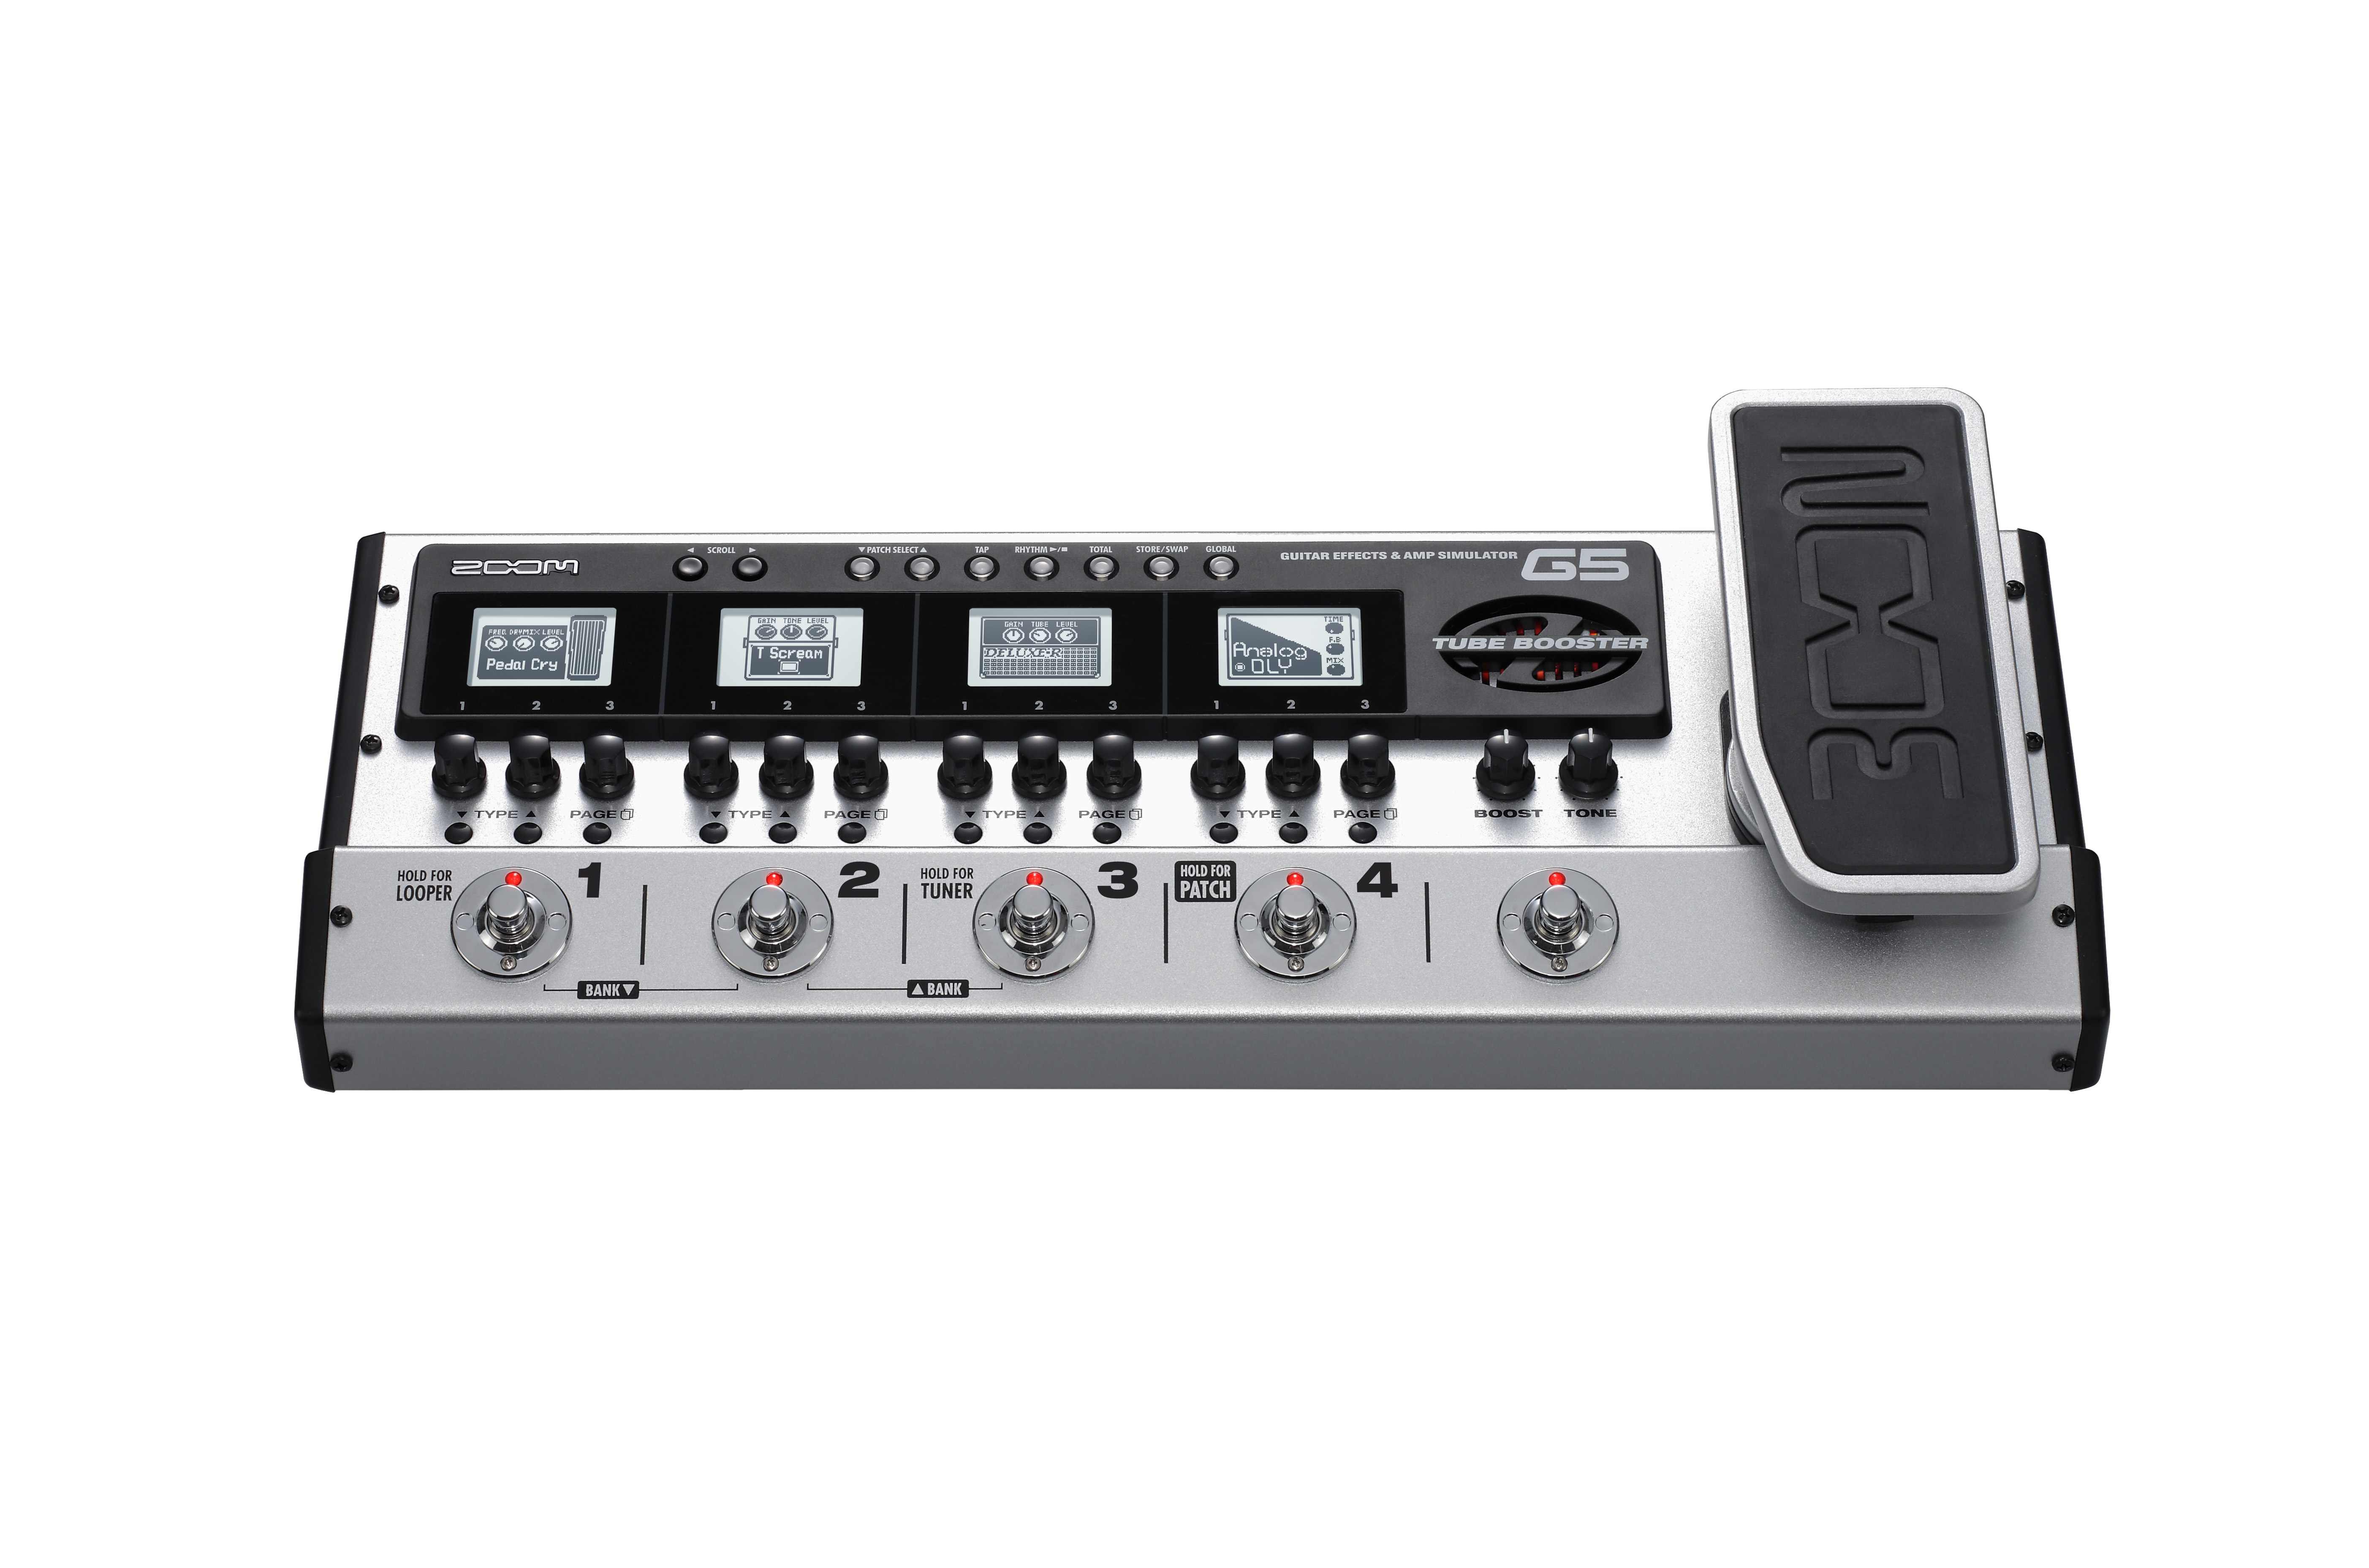 g5 guitar effects amp simulator pedal zoom. Black Bedroom Furniture Sets. Home Design Ideas